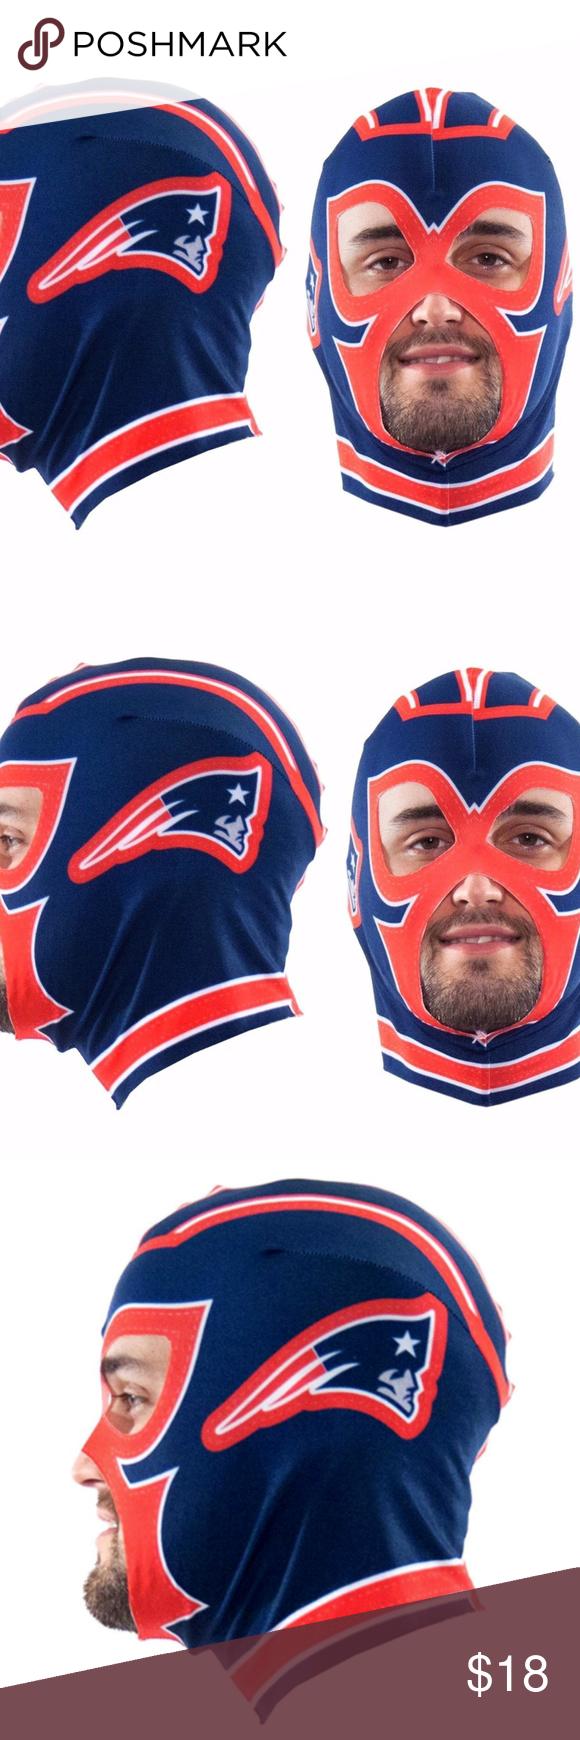 New England Patriots Nfl Fan Mask Wrestling Nfl Fans New England Patriots Nfl